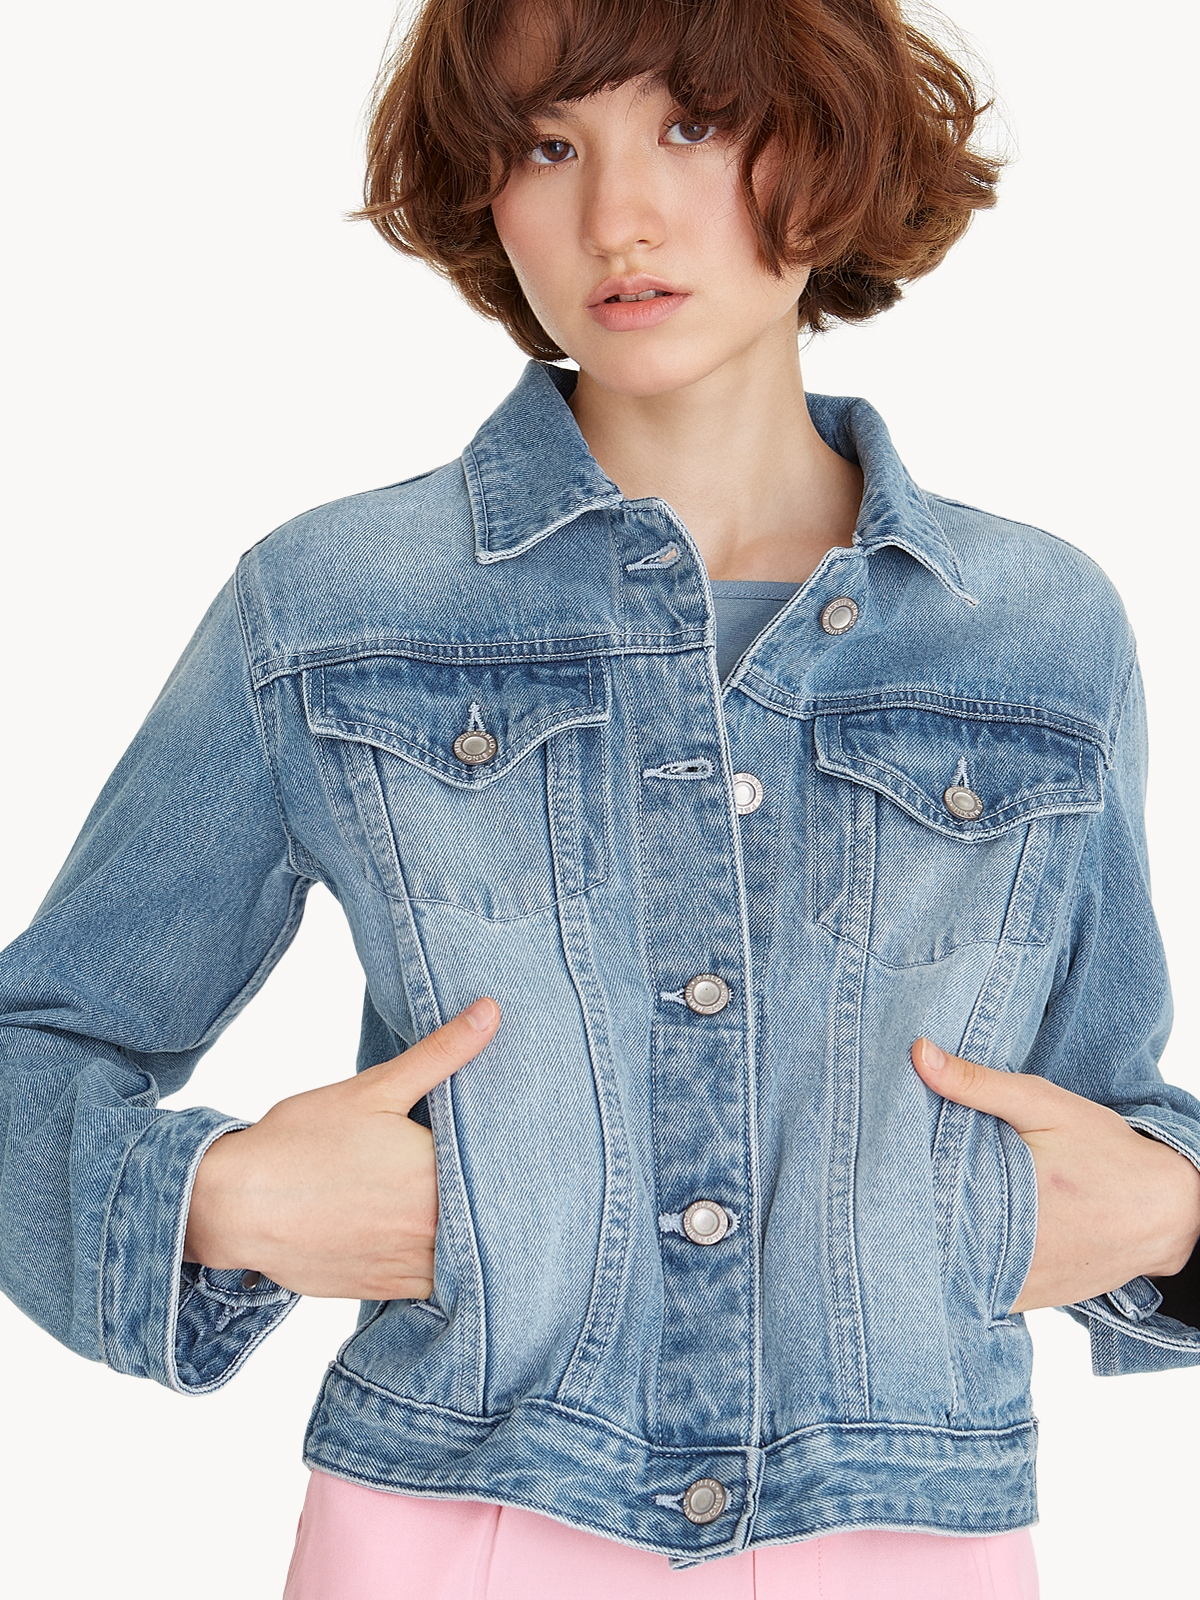 Outerwears Shoppr Malaysia Eozy Luxury Women Sleeveless Lace Long Maxi Dress European Style